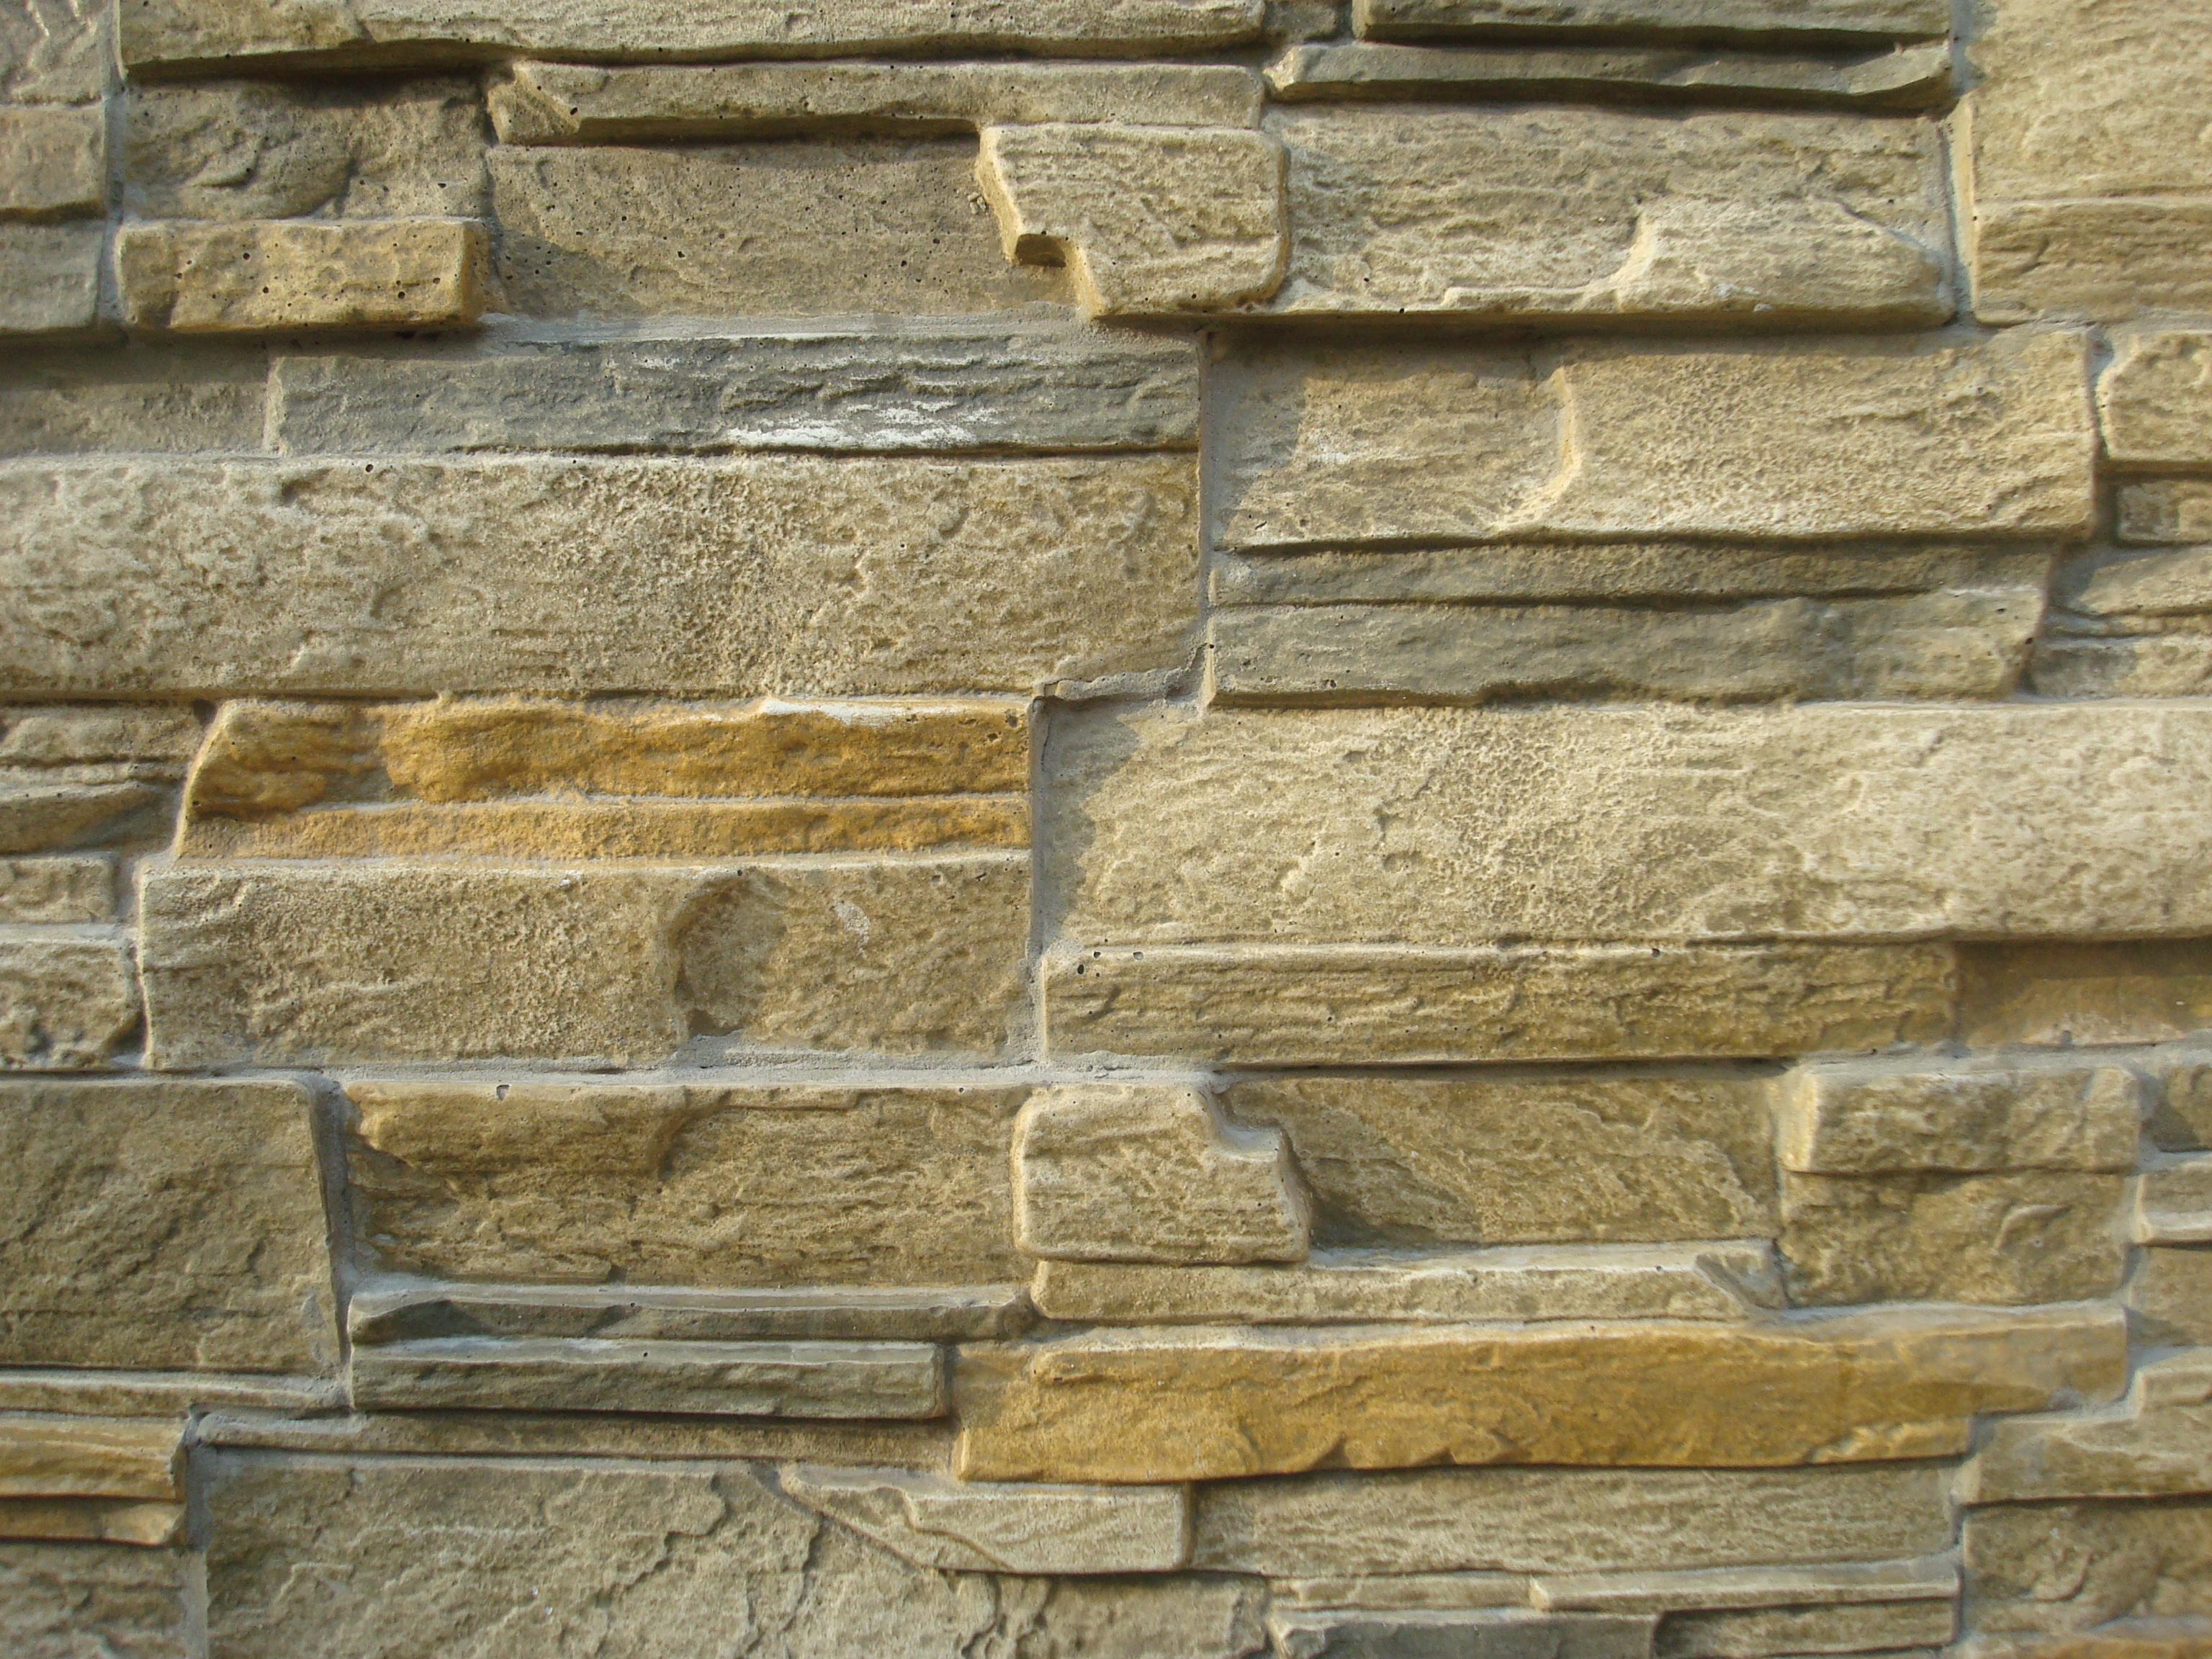 Brick wall texture, Artificial, Bricks, Brown, Building, HQ Photo